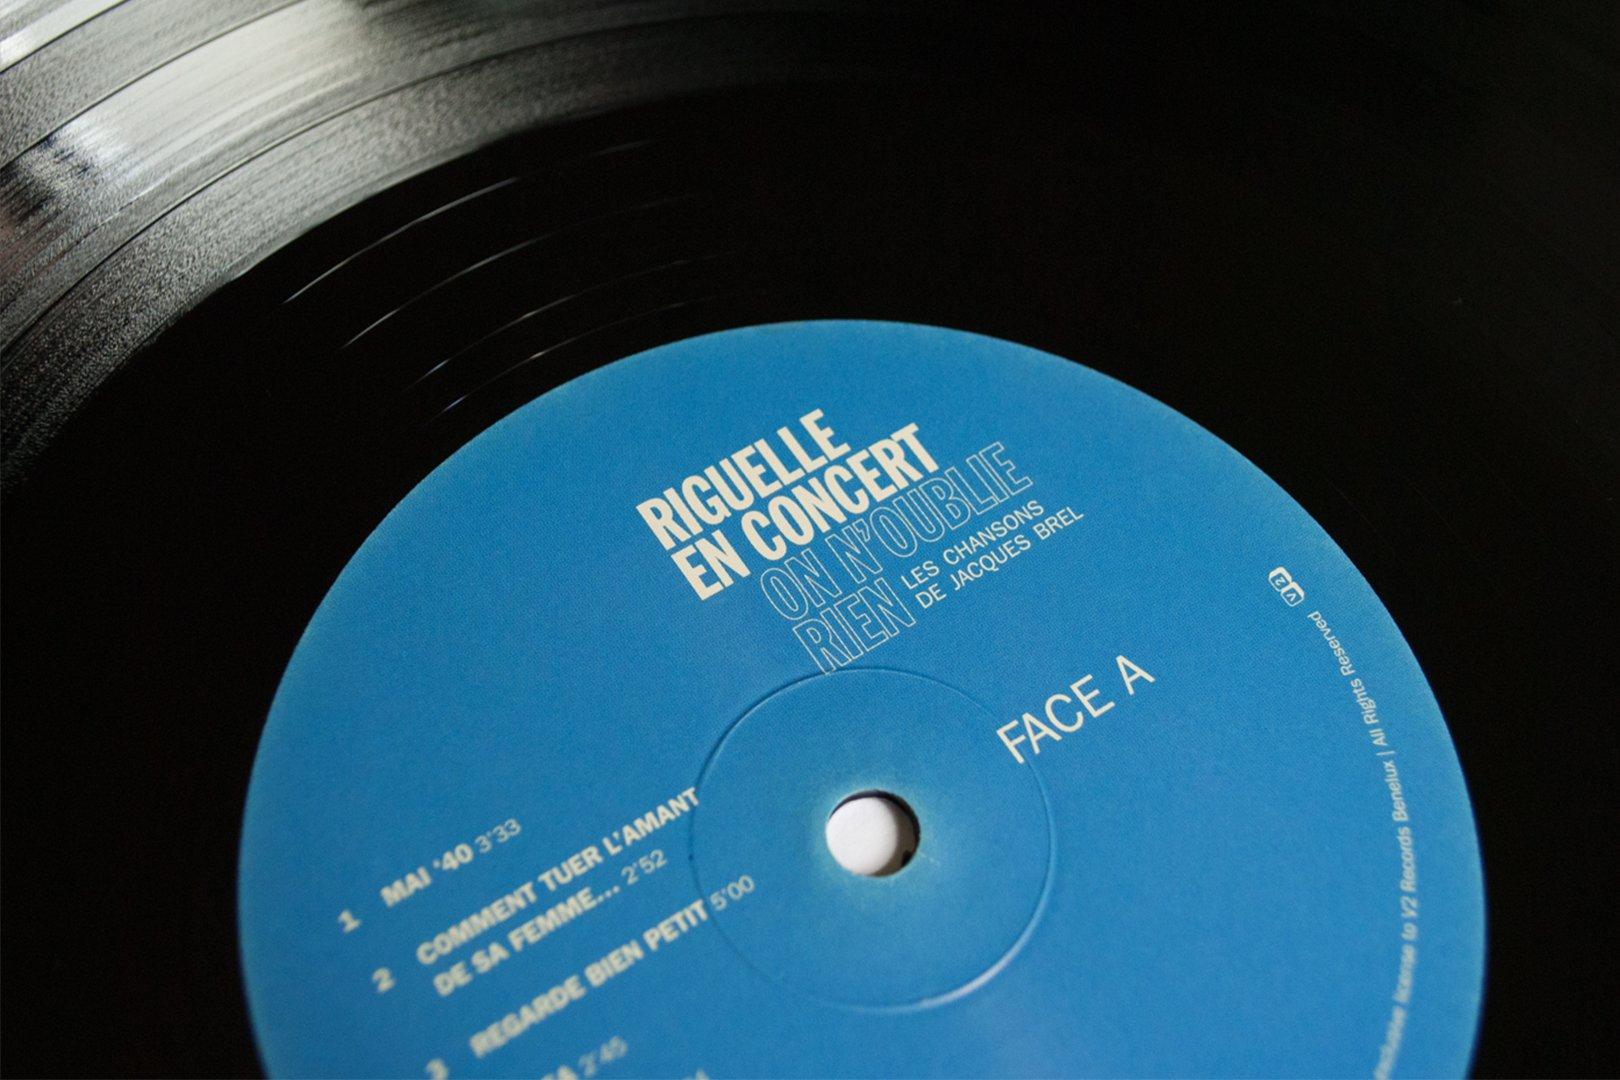 Riguelle grafisch typografie verpakking album ontwerp